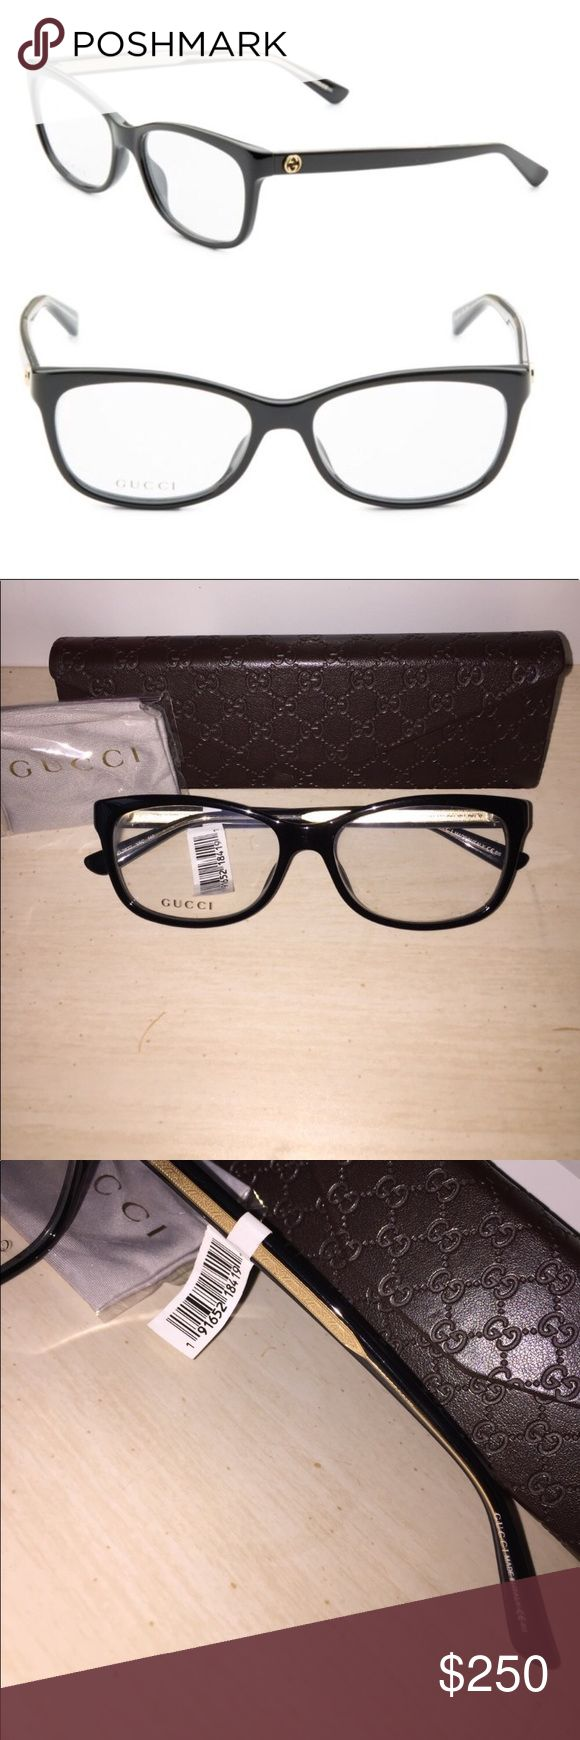 how to put prescription lenses in frames